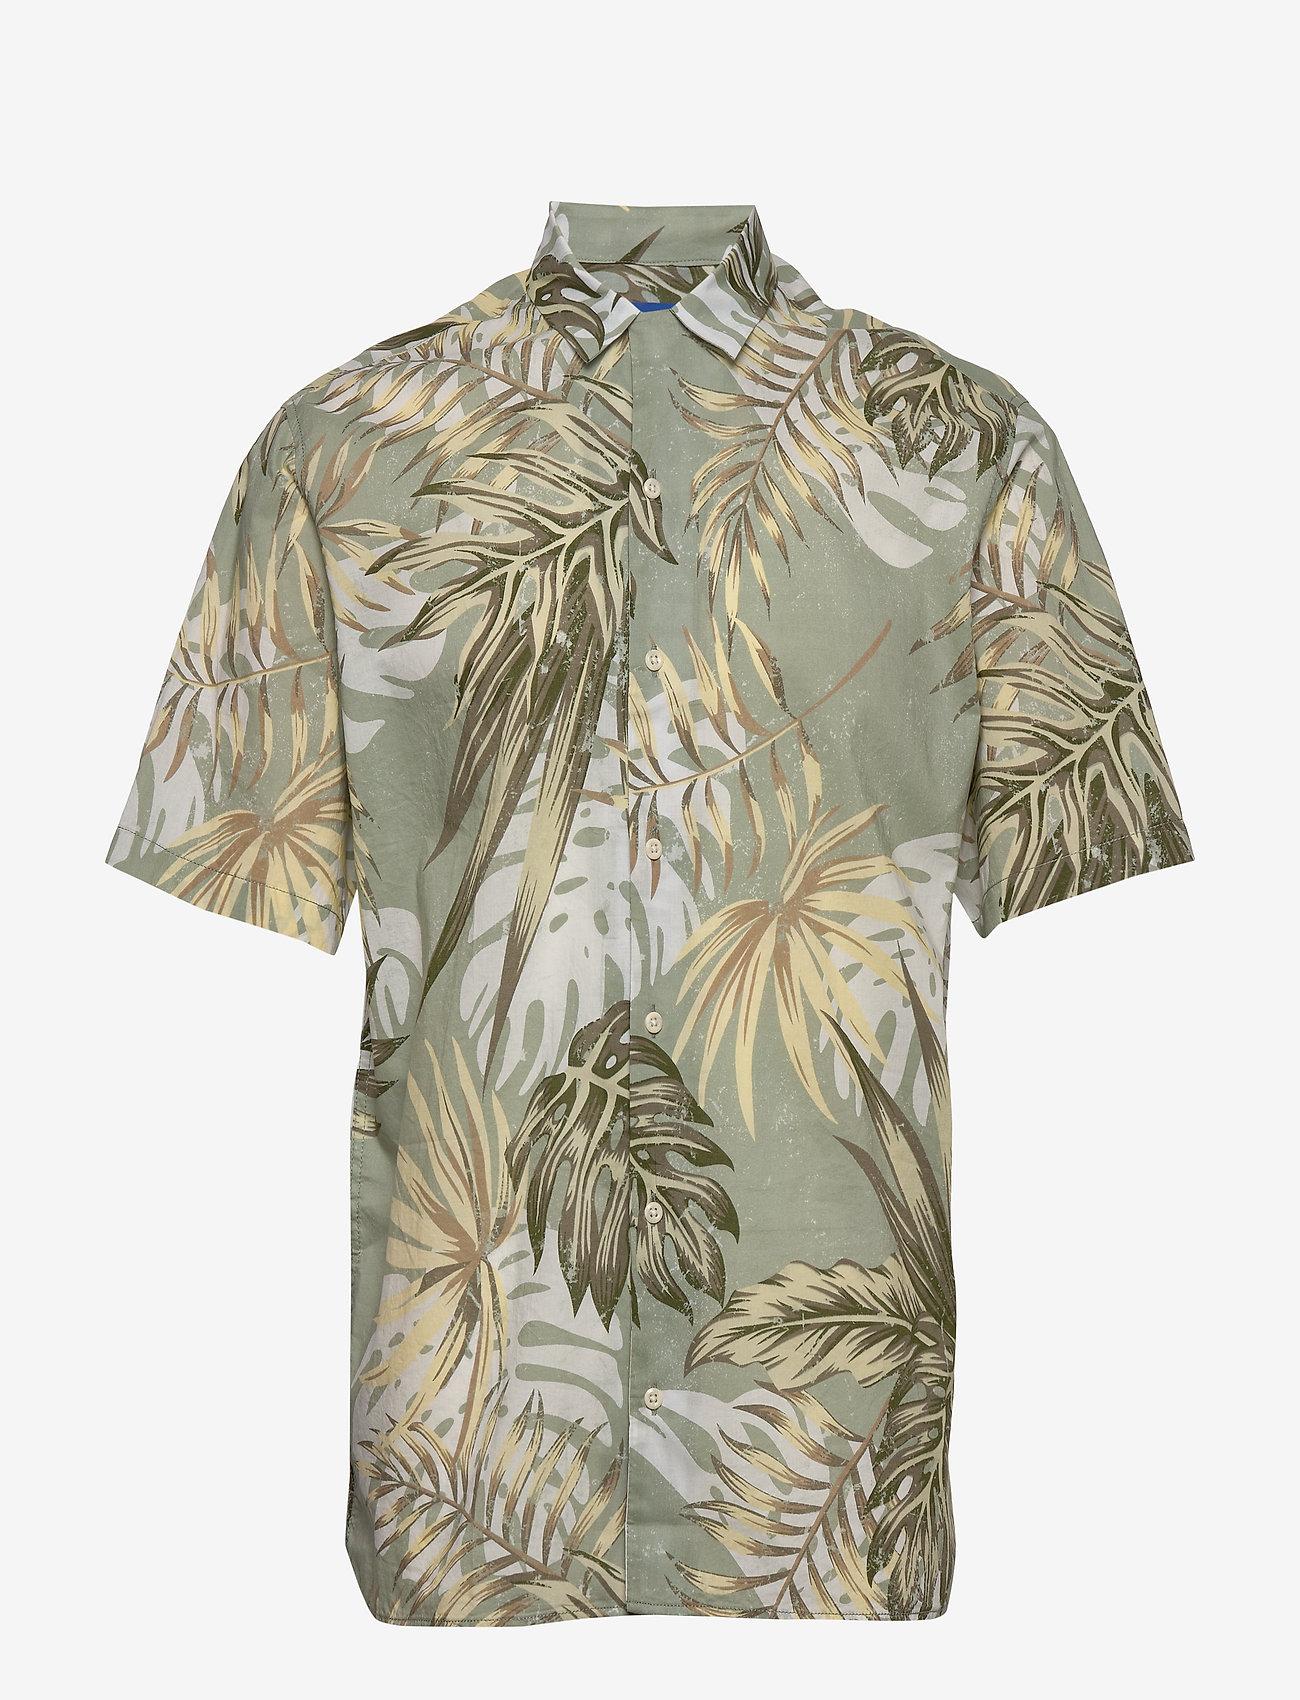 Jack & Jones - JORMARTY ORGANIC SHIRT SS - kortermede skjorter - green milieu - 1